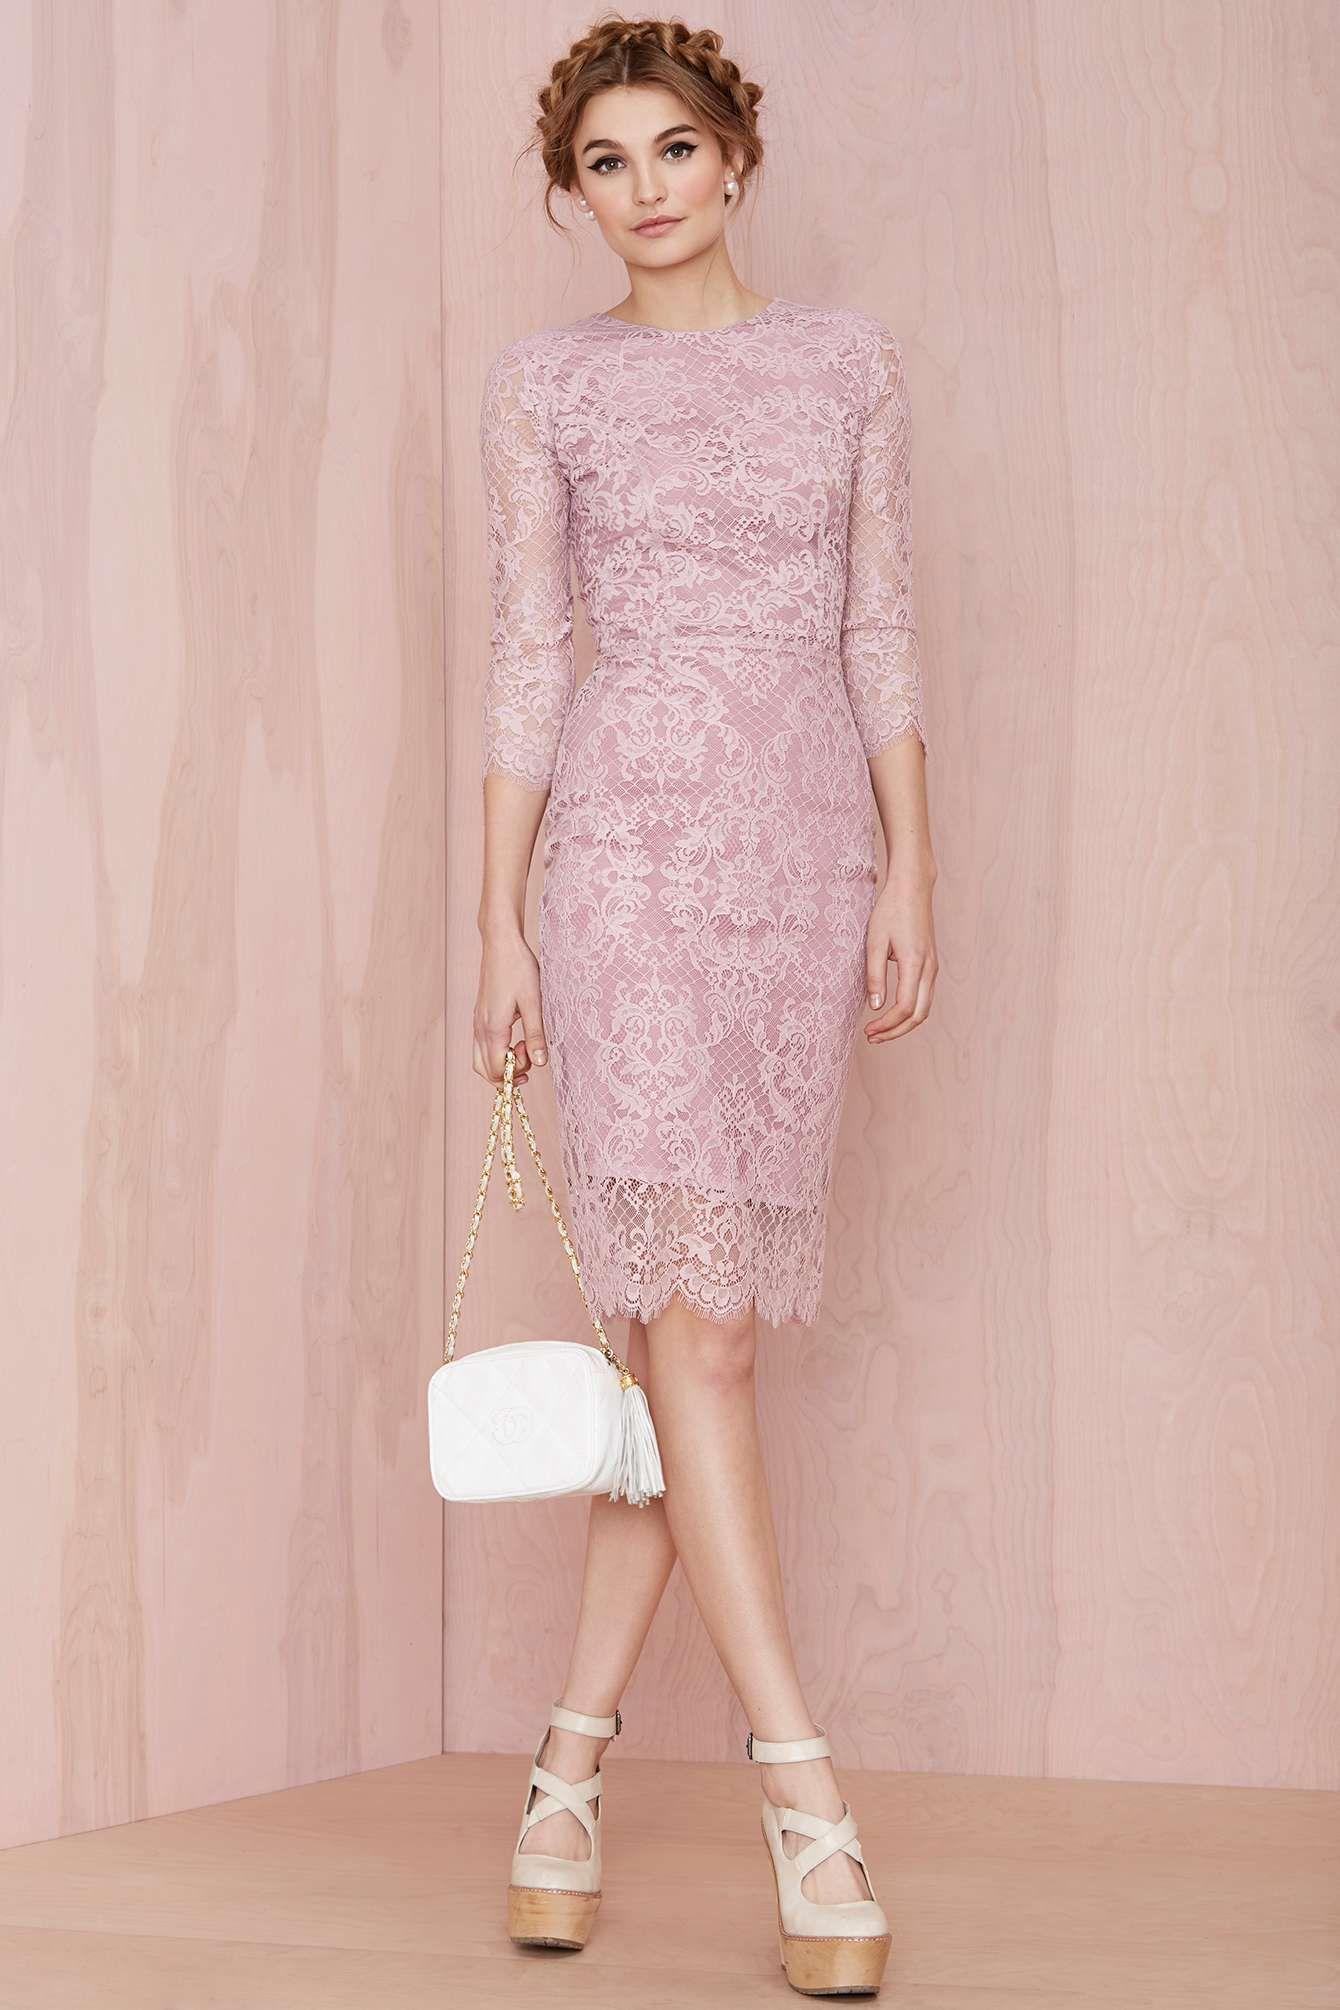 Pink Lace Dress   Cute outfits   Pinterest   Trajes de fiesta, La ...